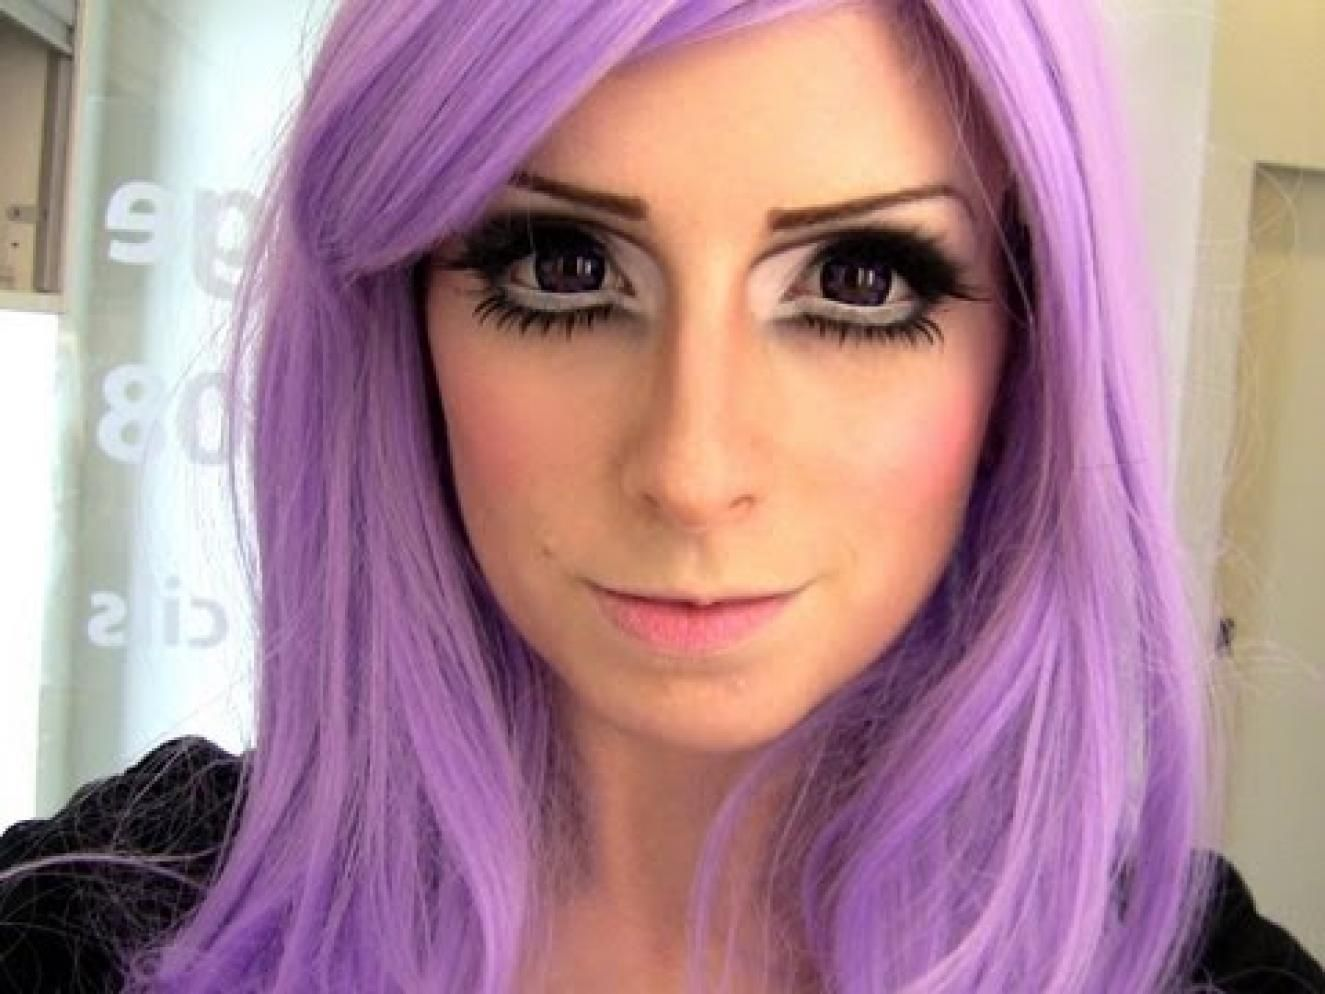 Cool purple hair and halloween makeup fun. Anime makeup